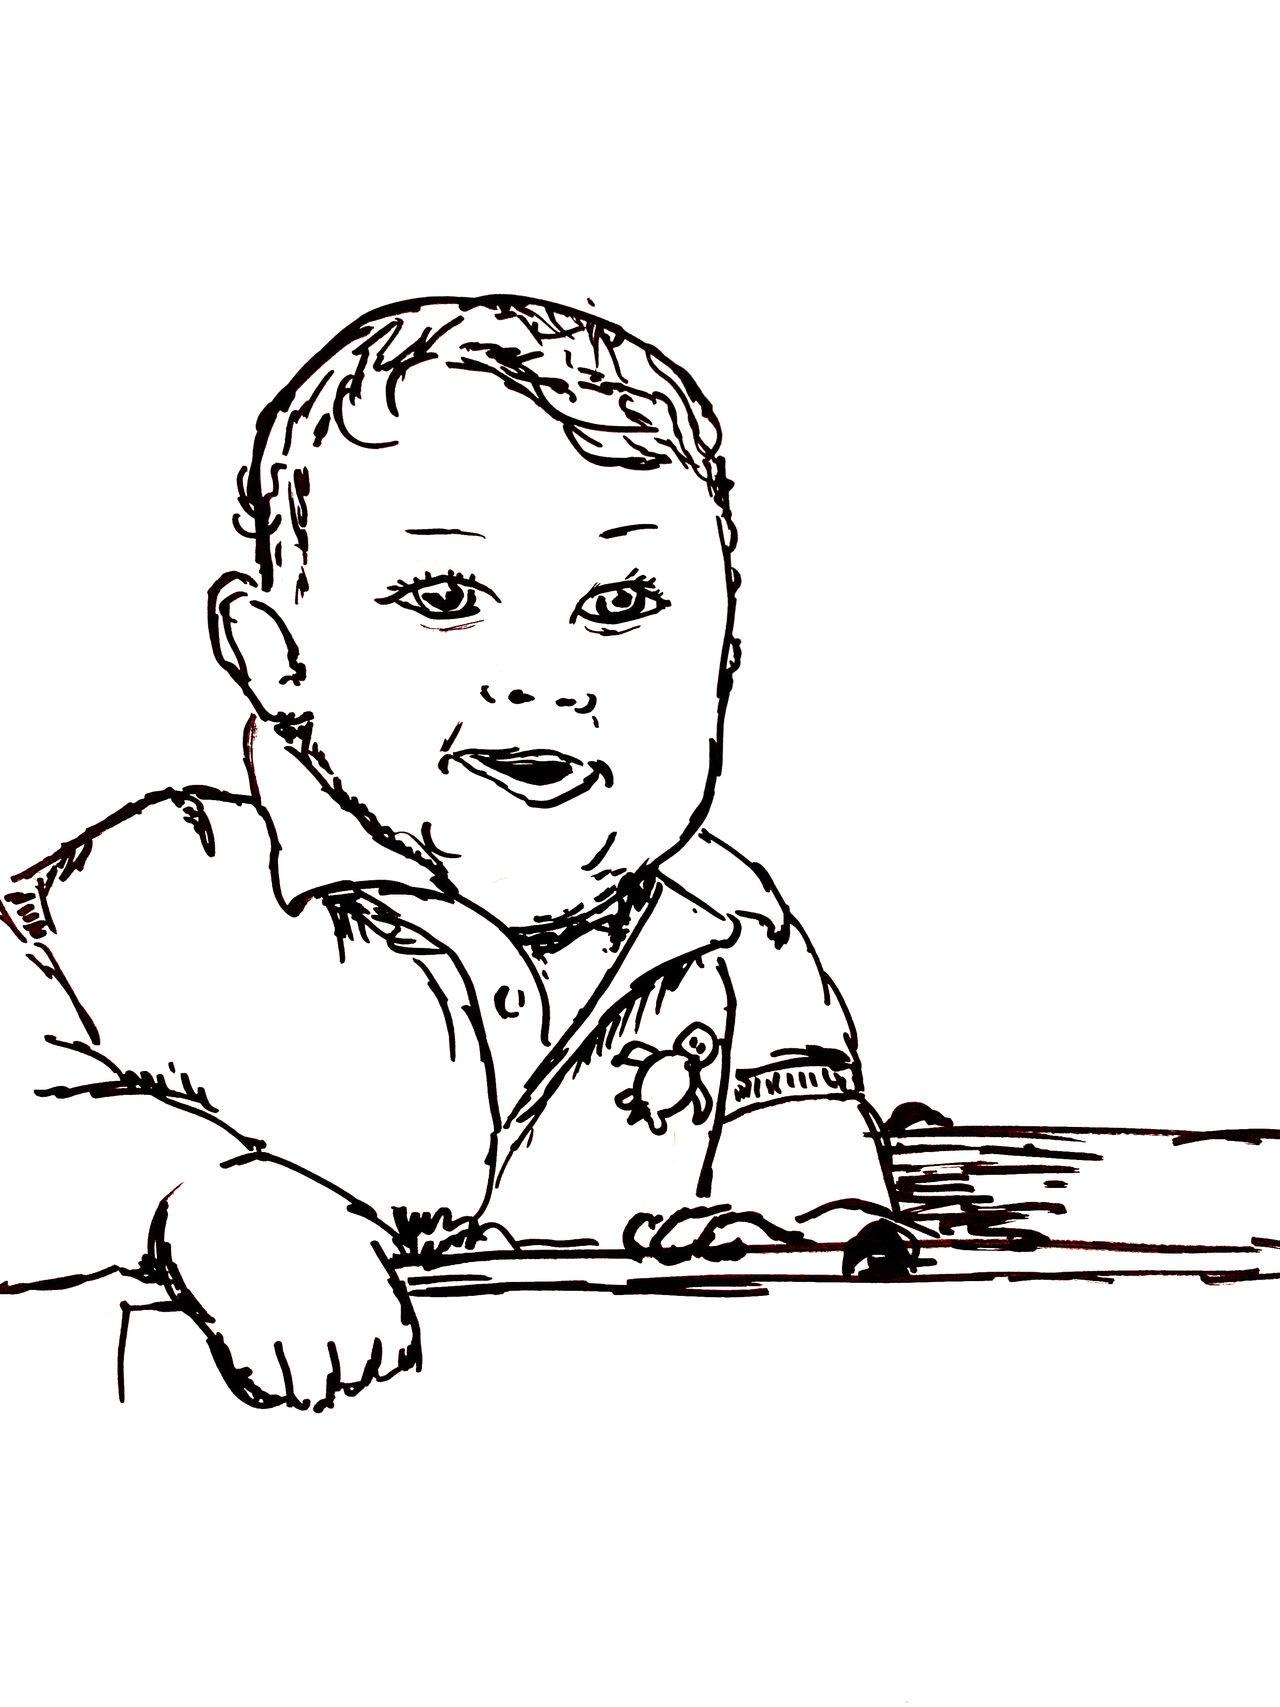 Baby Boy in Shopping Cart Sketch